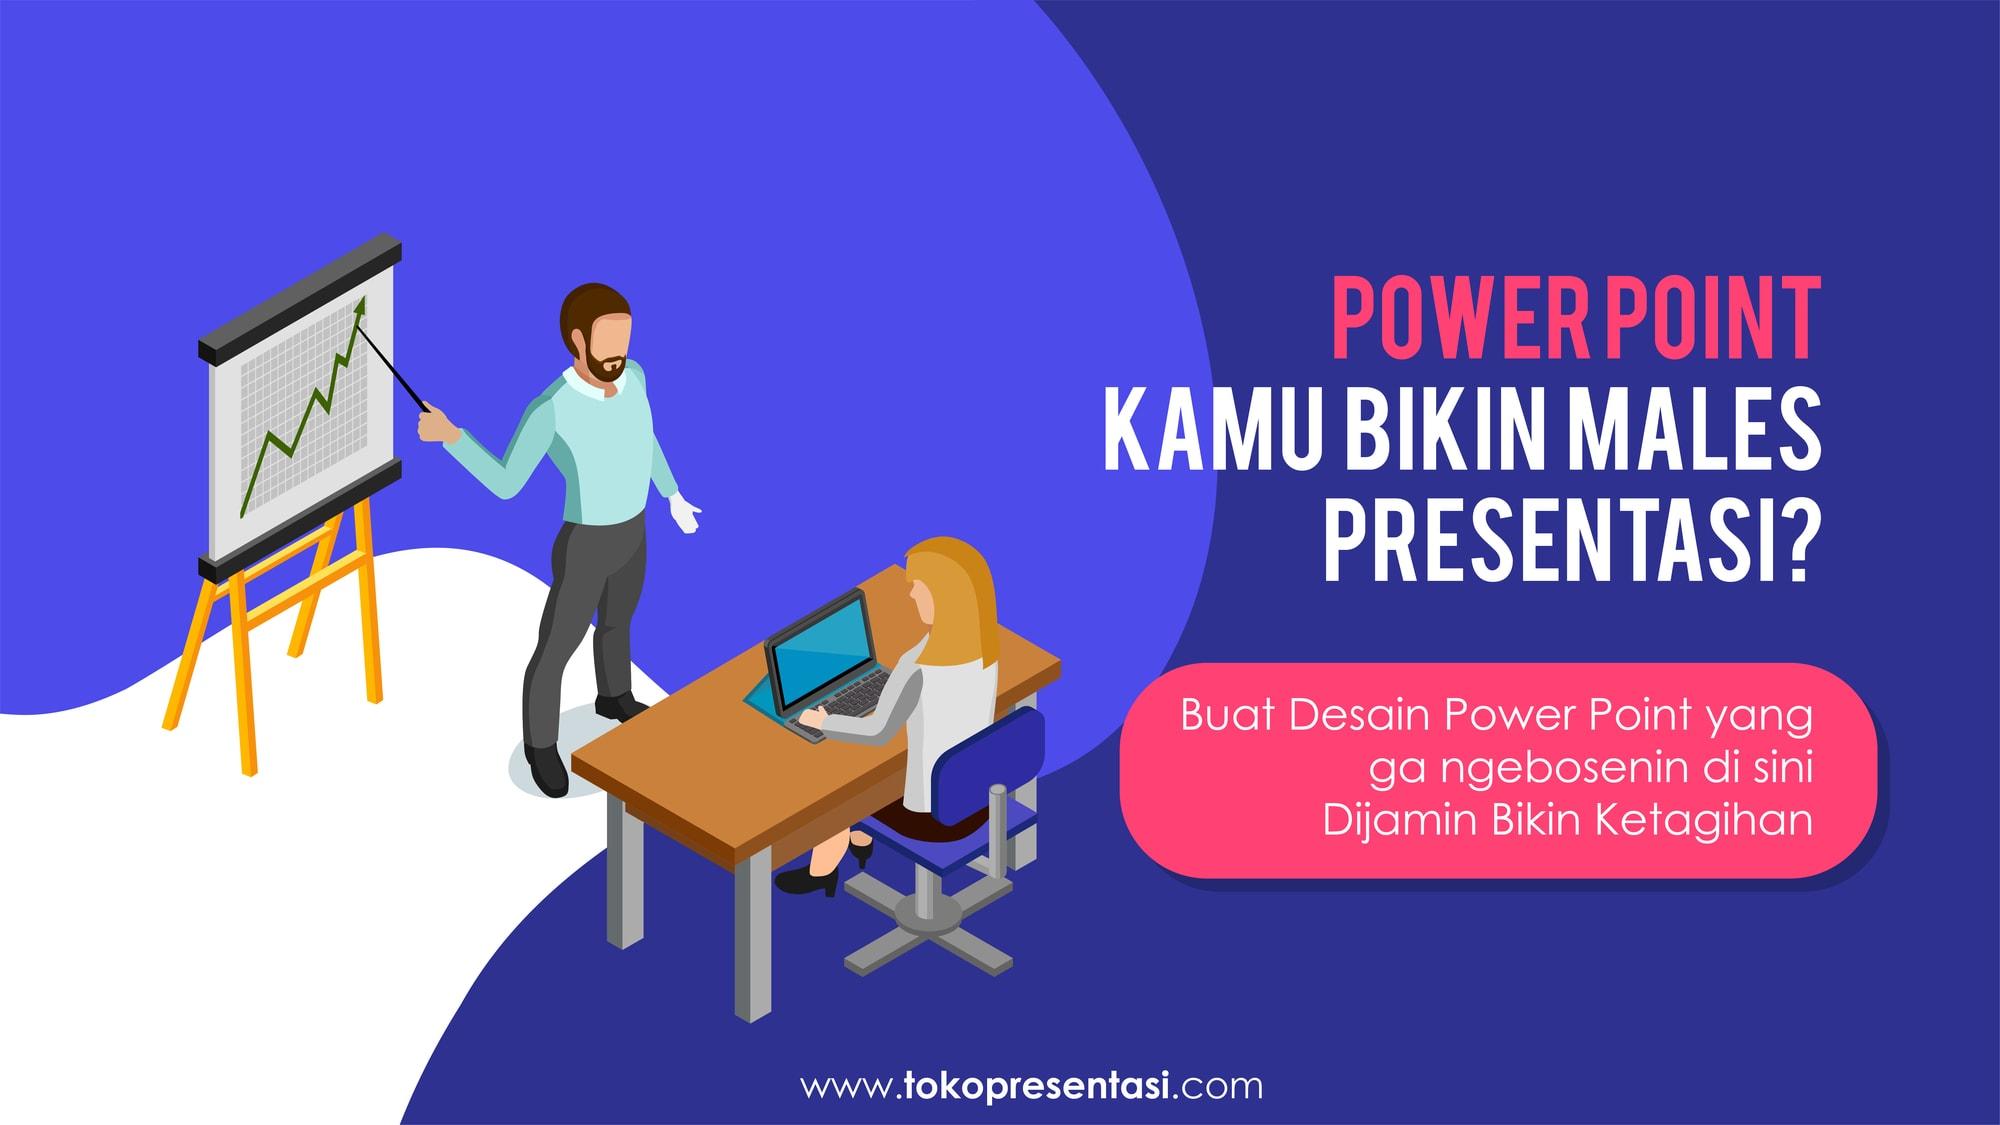 Jasa Pembuatan Desain Presentasi Powerpoint Lomba Inovasi GKM WKM TKMPN Polymeditra Indonesia Tokopresentasi